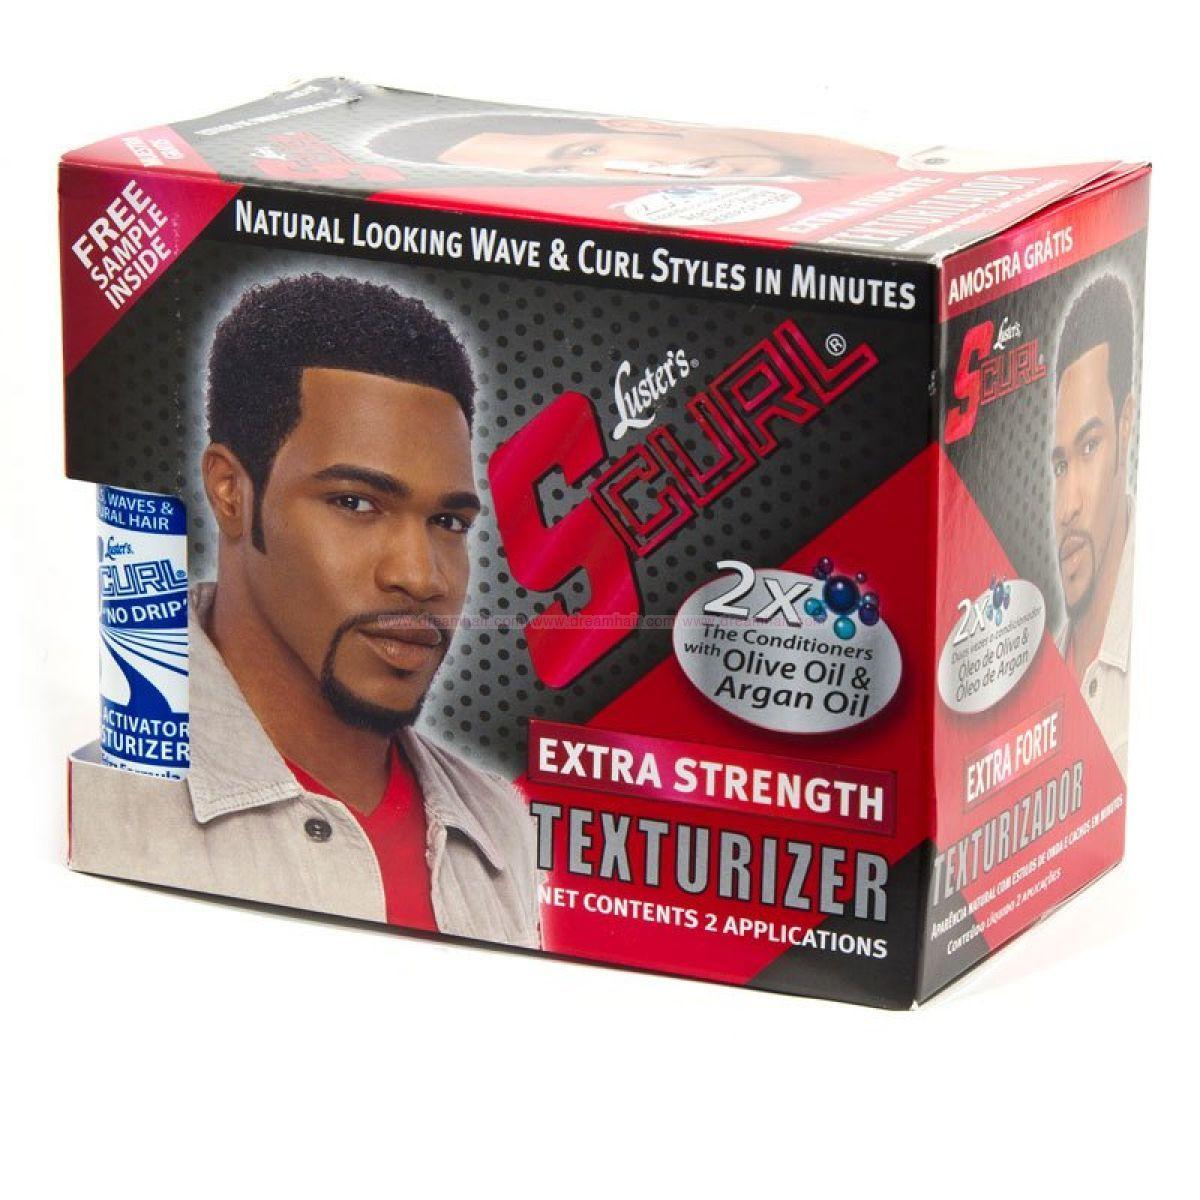 Er S Curl Extra Strength Texturizer Kit